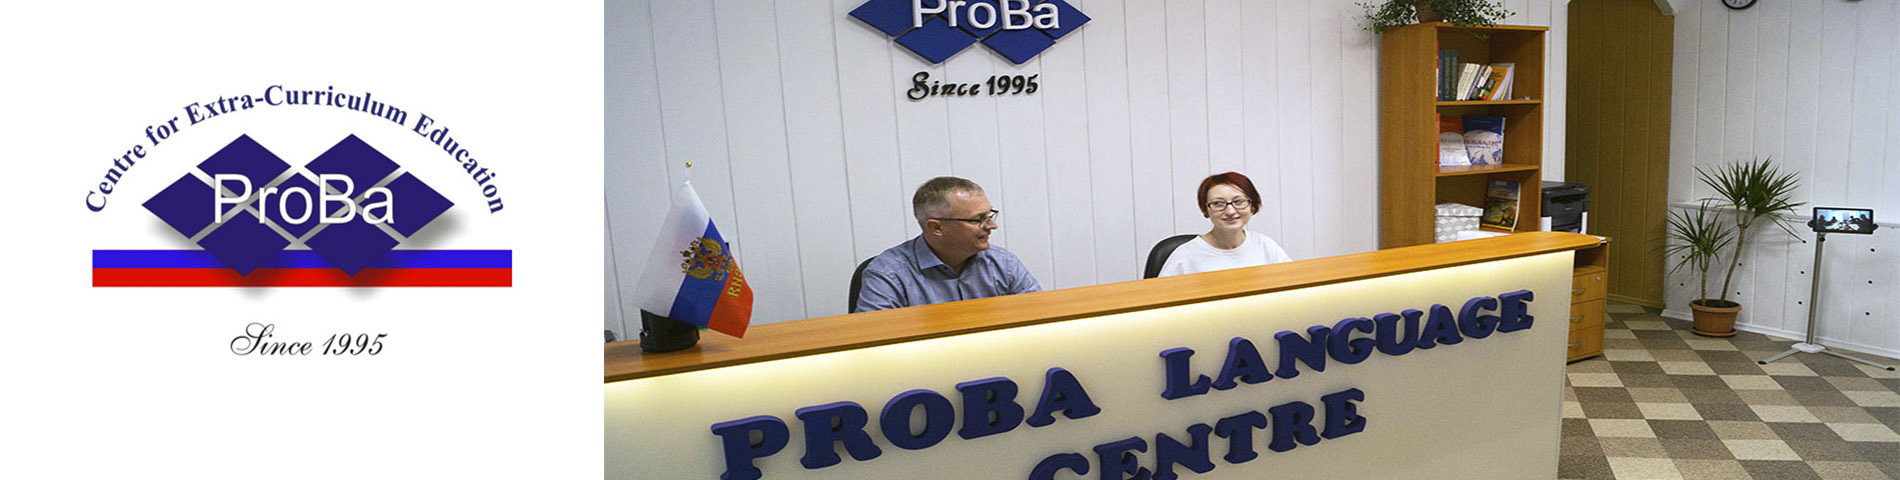 ProBa Educational Centre Bild 1